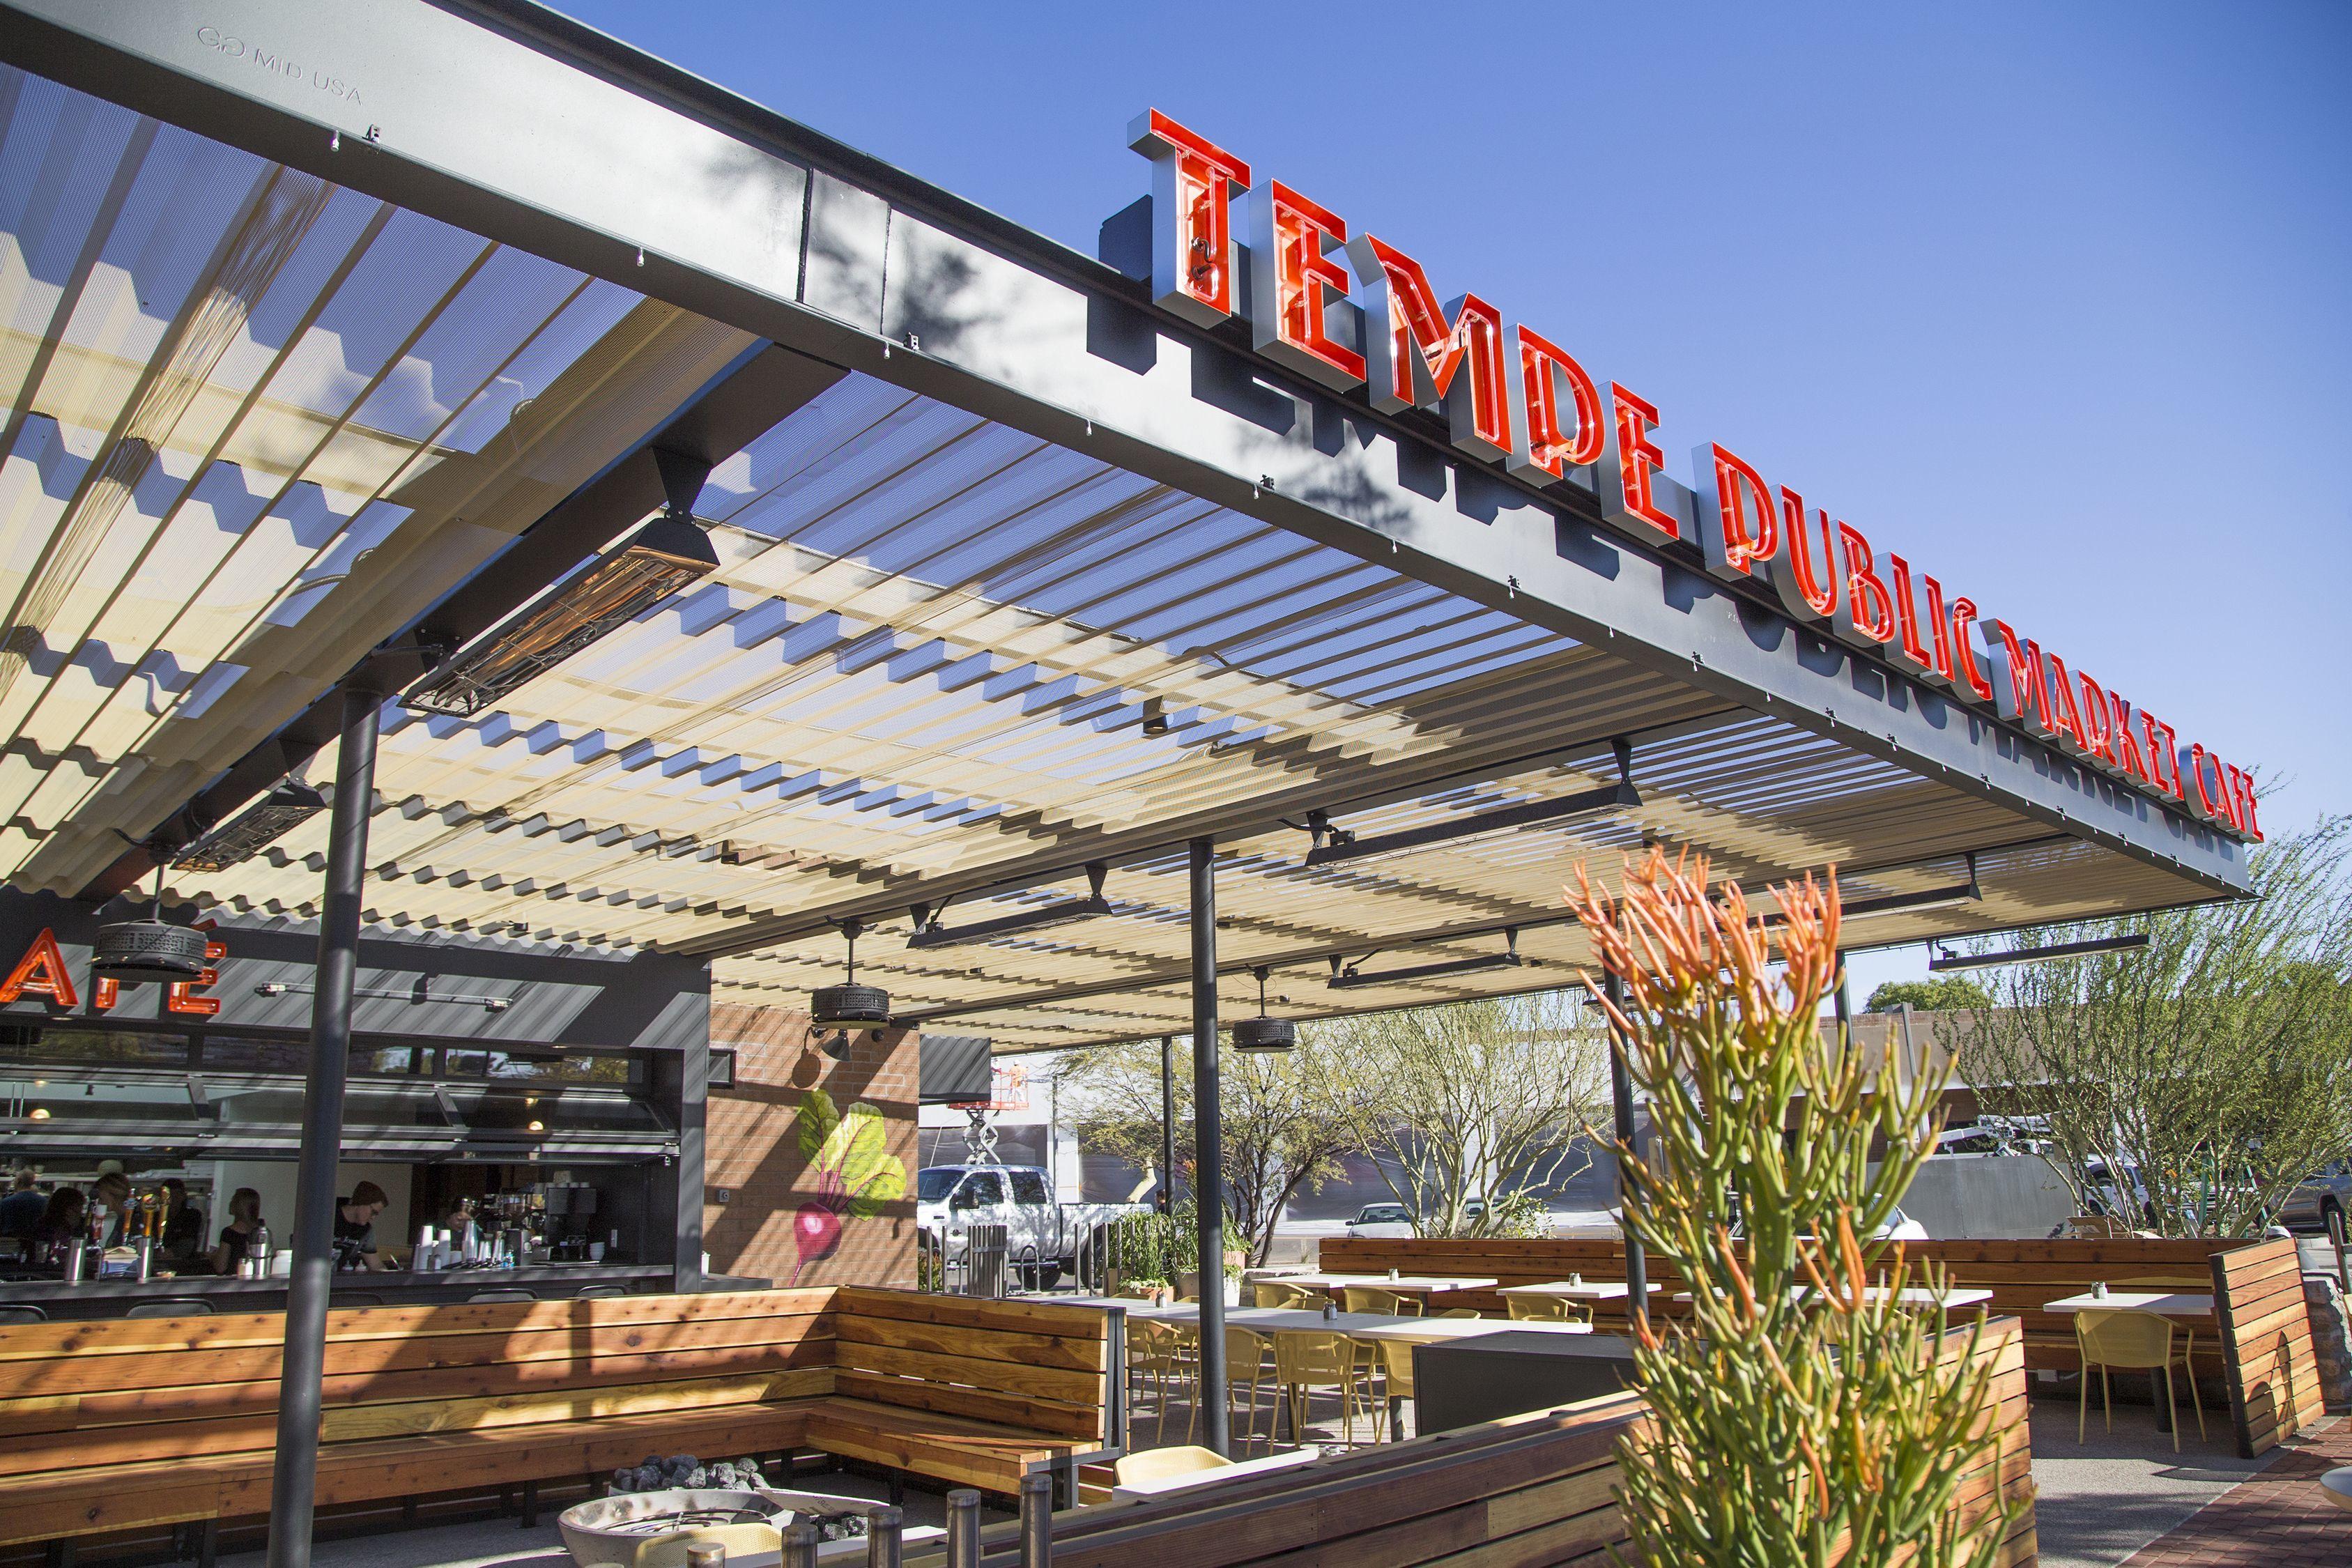 Tempe Public Market Cafe | Nov. 12, buy one entree,get one free. | Details: 8749 S. Rural Road, Tempe. 480-629-5120, tempepublicmarket.com.